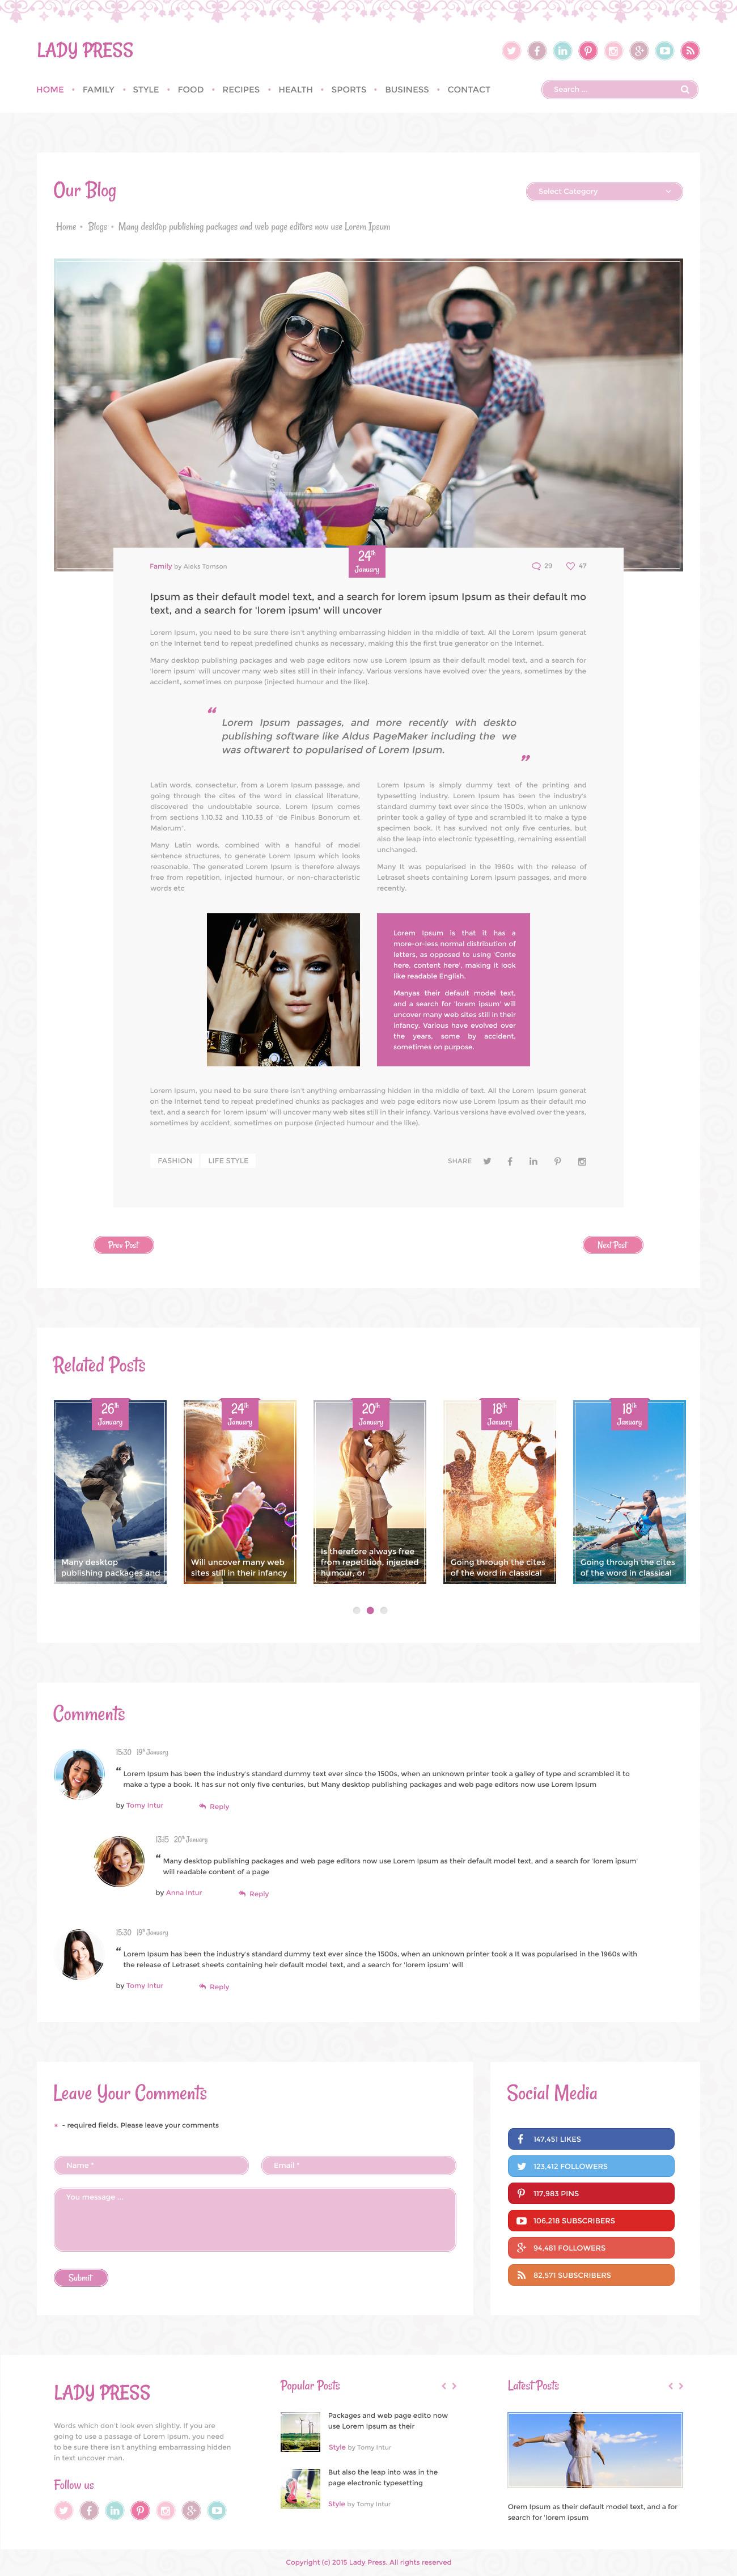 LadyPress - Woman Magazine Blog HTML Template by Templatation ...